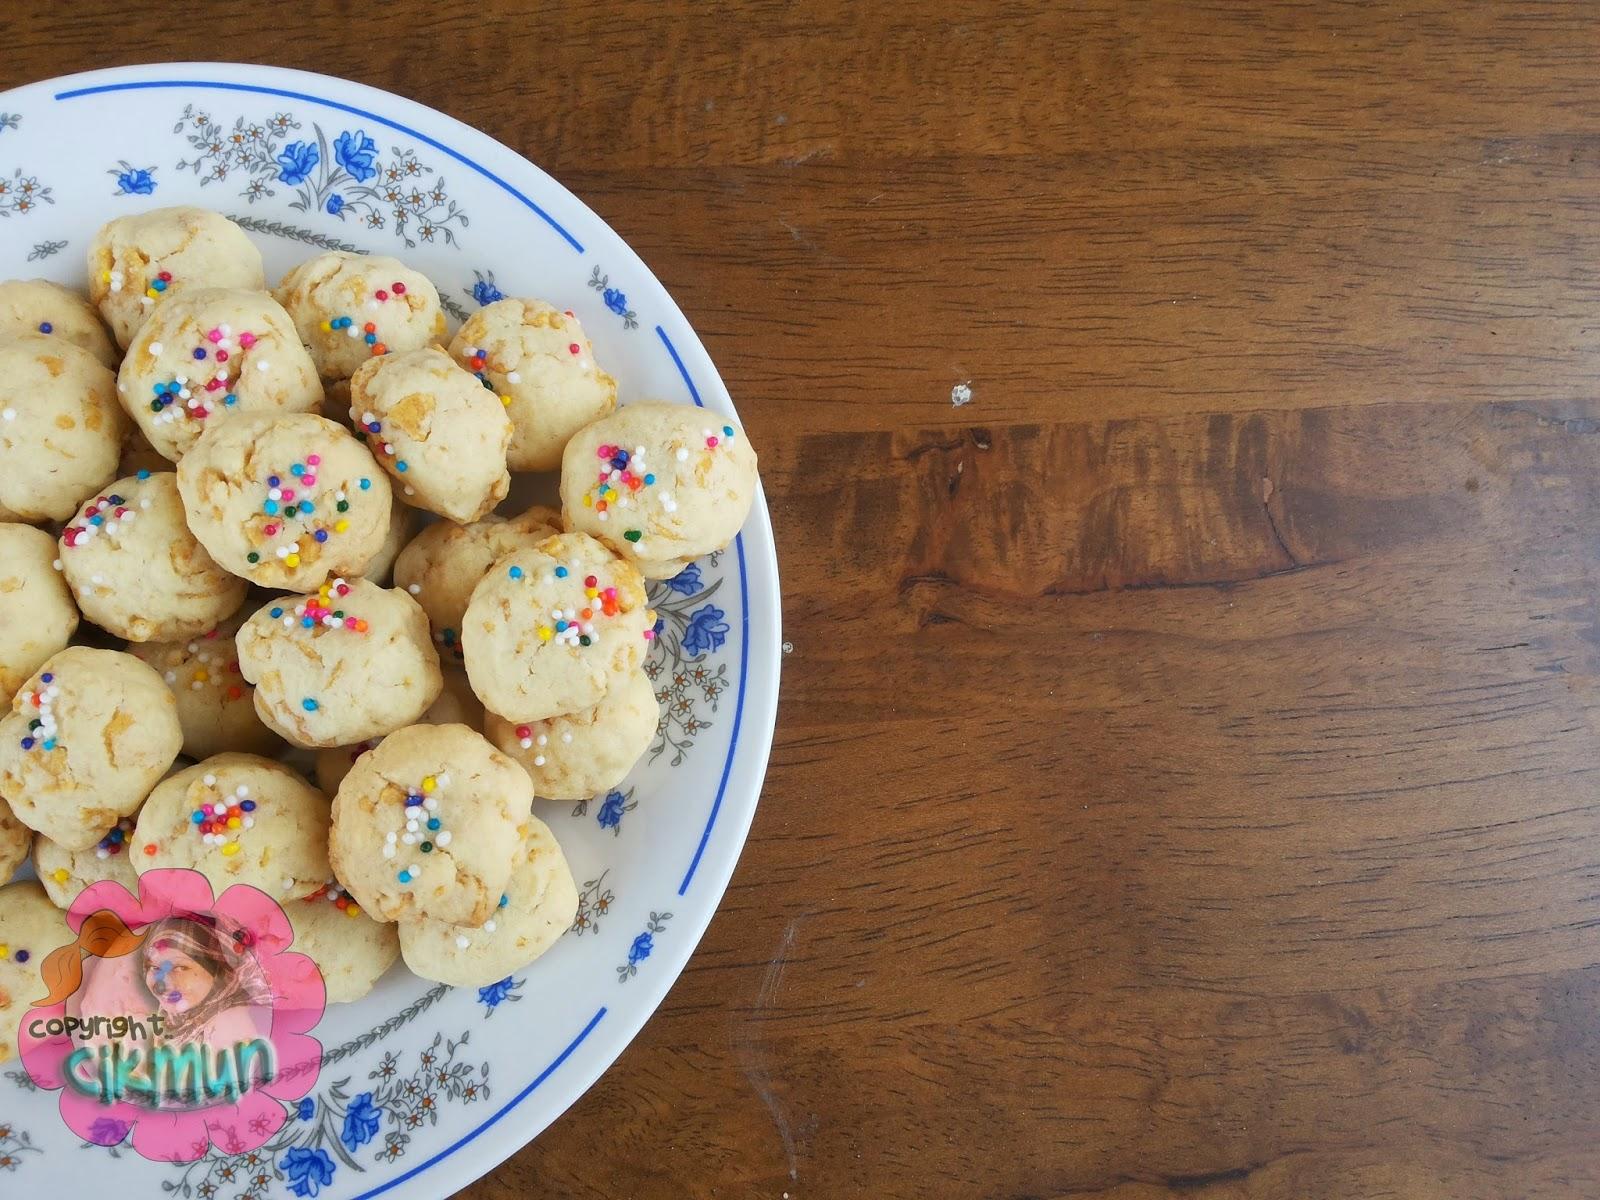 biskut raya, menu hari raya, kuih raya, cornflake, cornflake ranggup, biskut cornflake, cornflake sedap, biskut sedap, biskut cornflake mudah, resepi, resepi mama carey, resepi almond london, #munmasak,